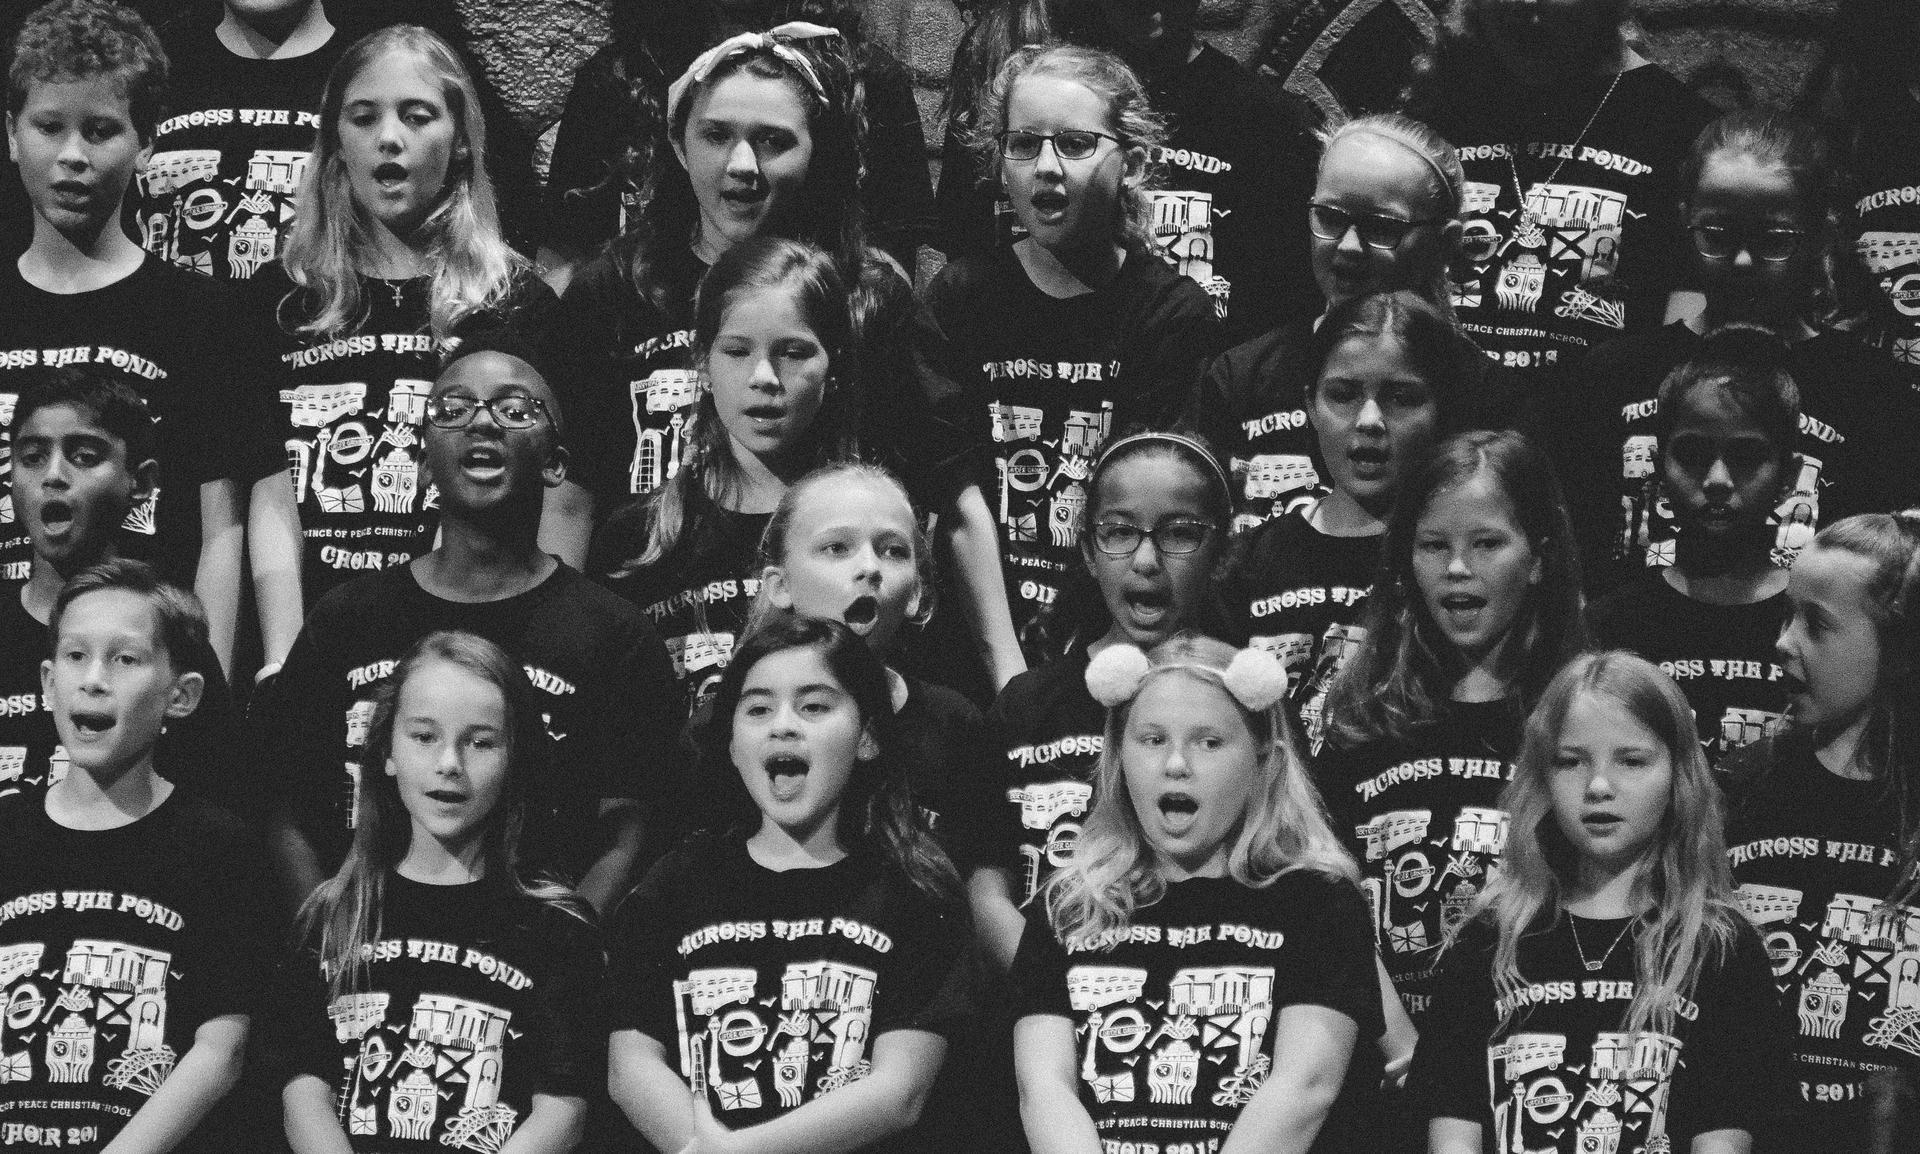 Group photo of Choir Concert